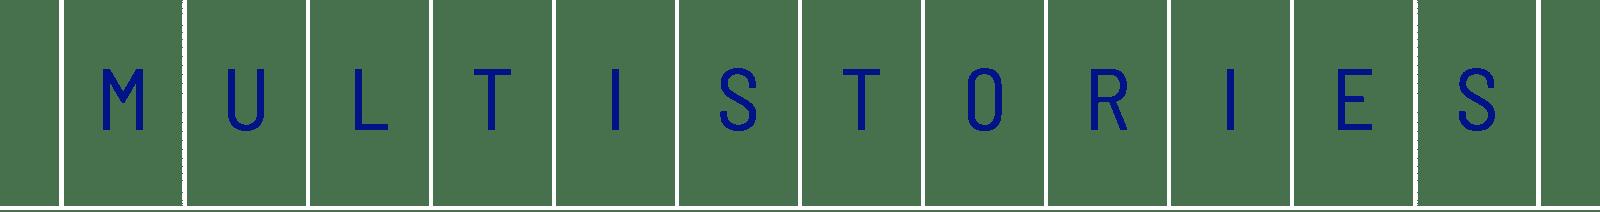 Multi Stories Logo